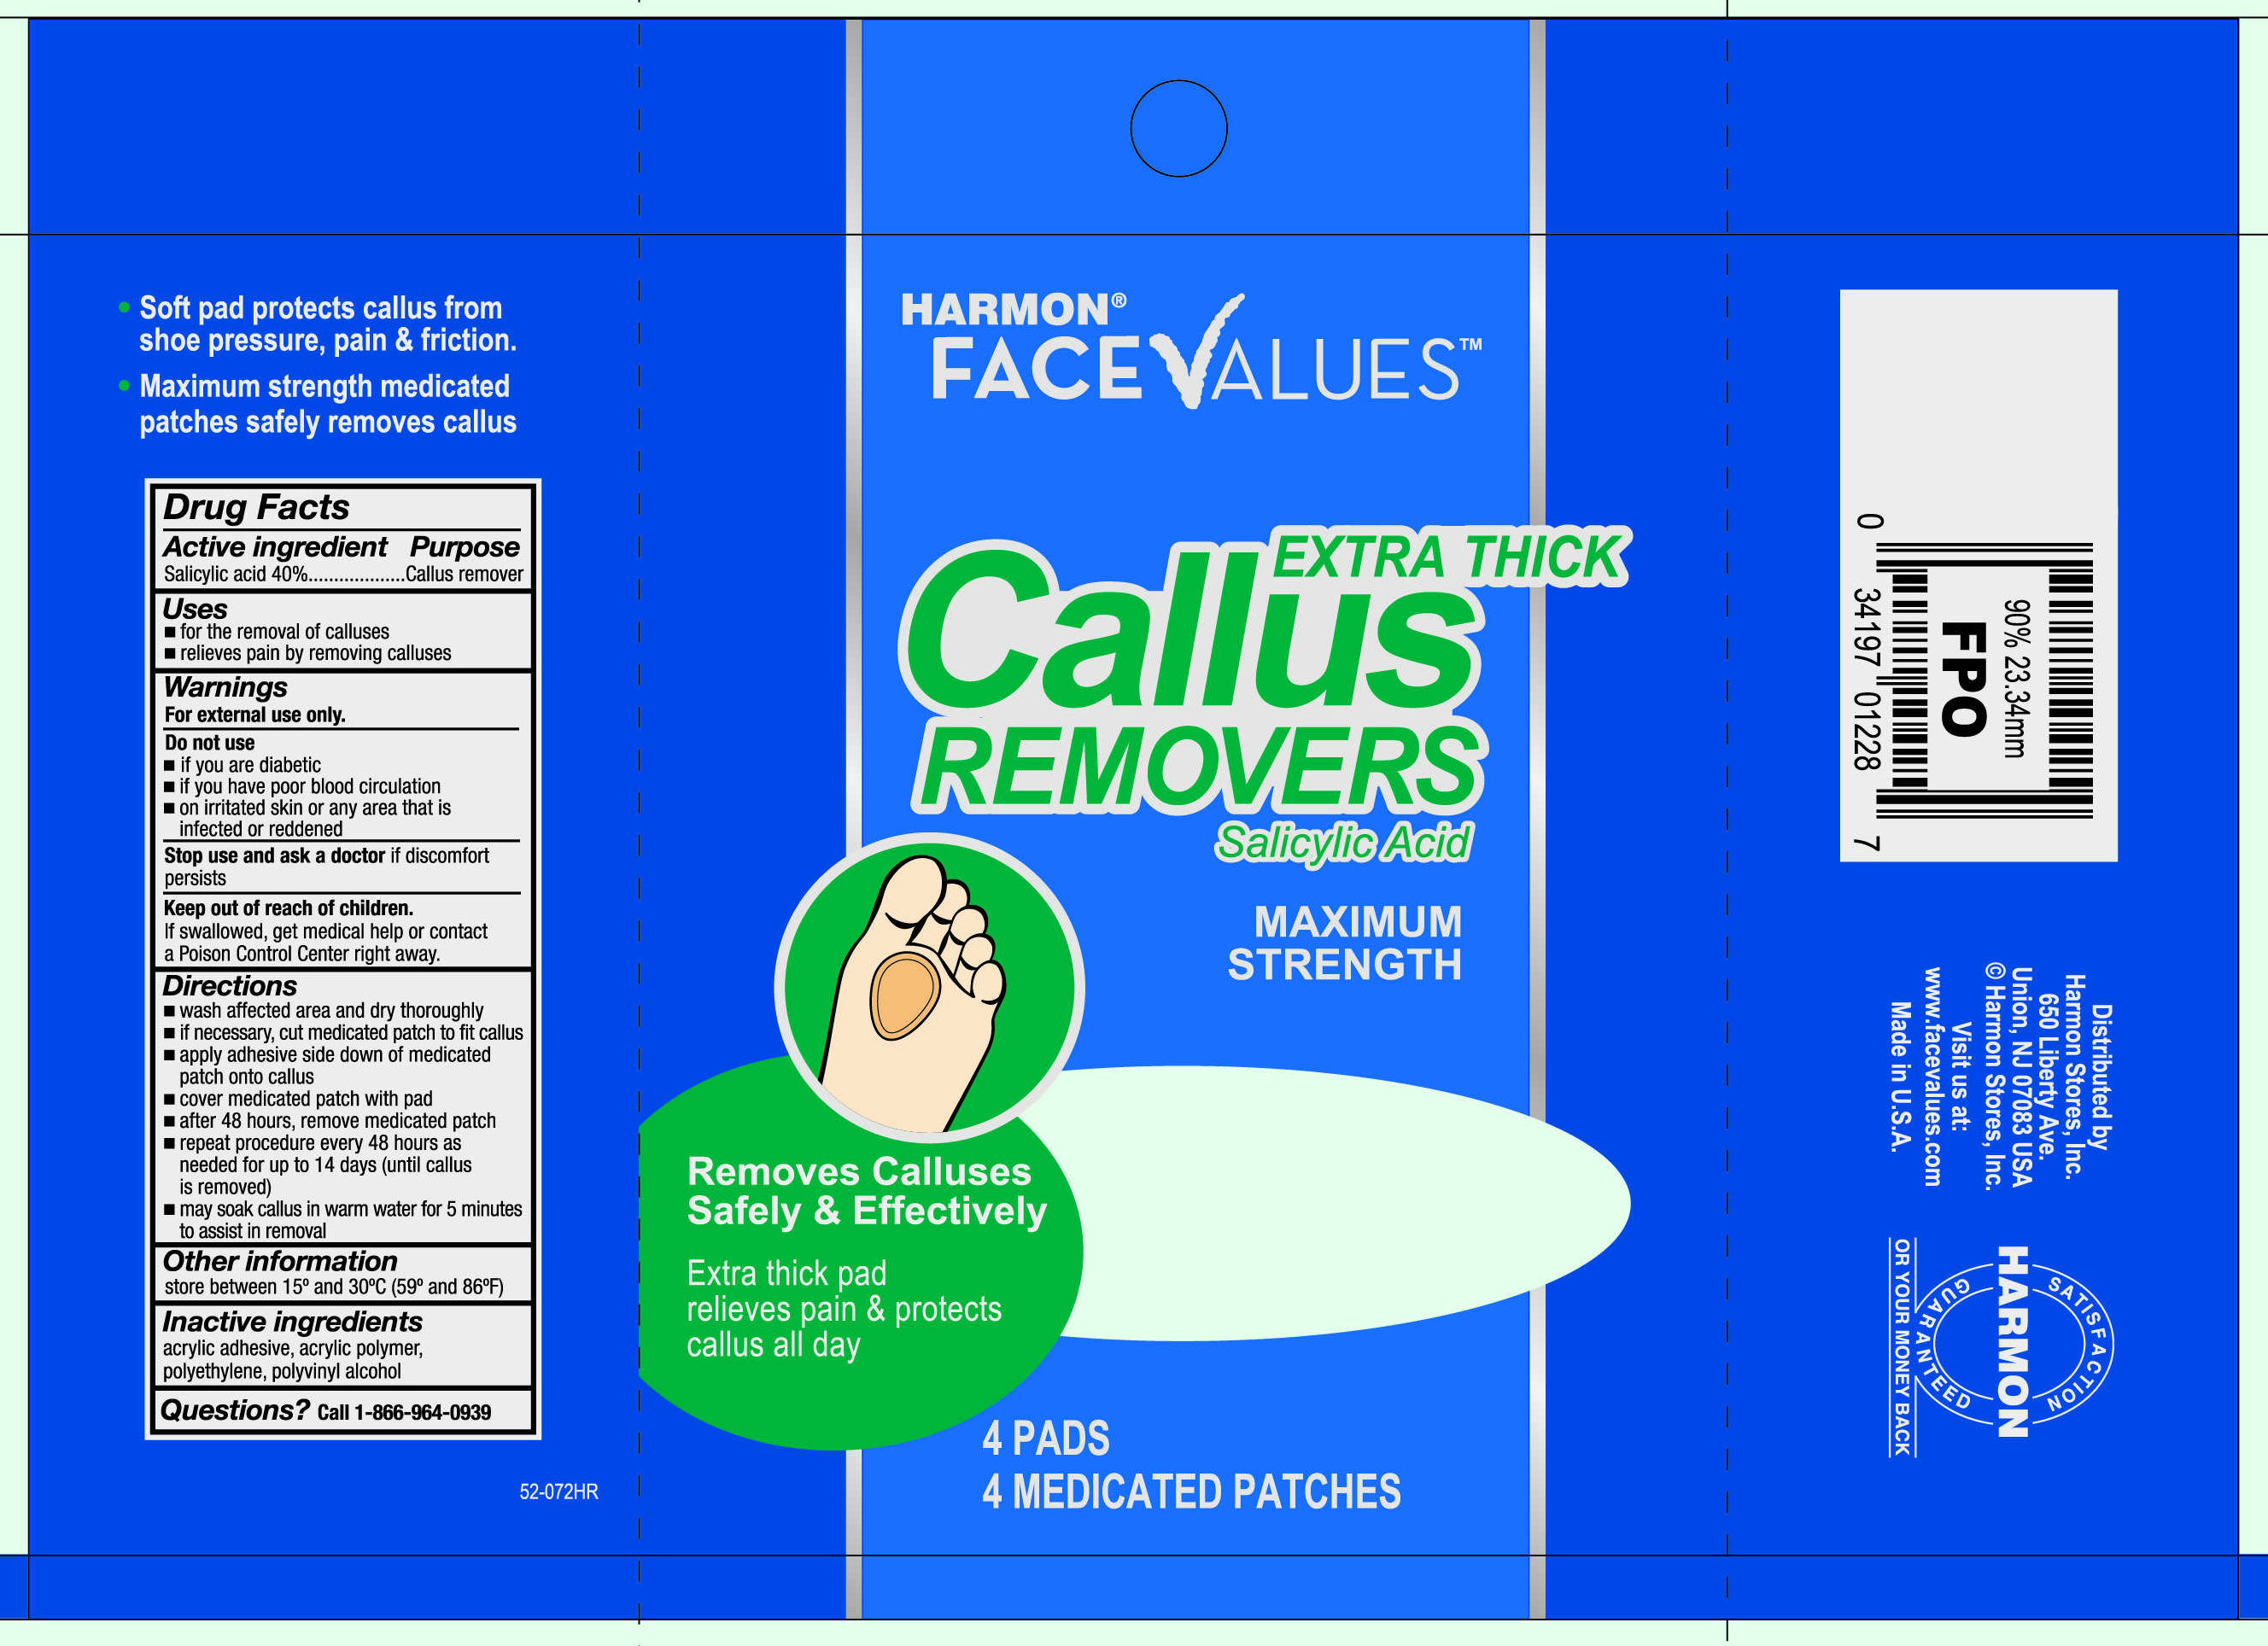 Harmon Extra Thick Callus Remover.jpg